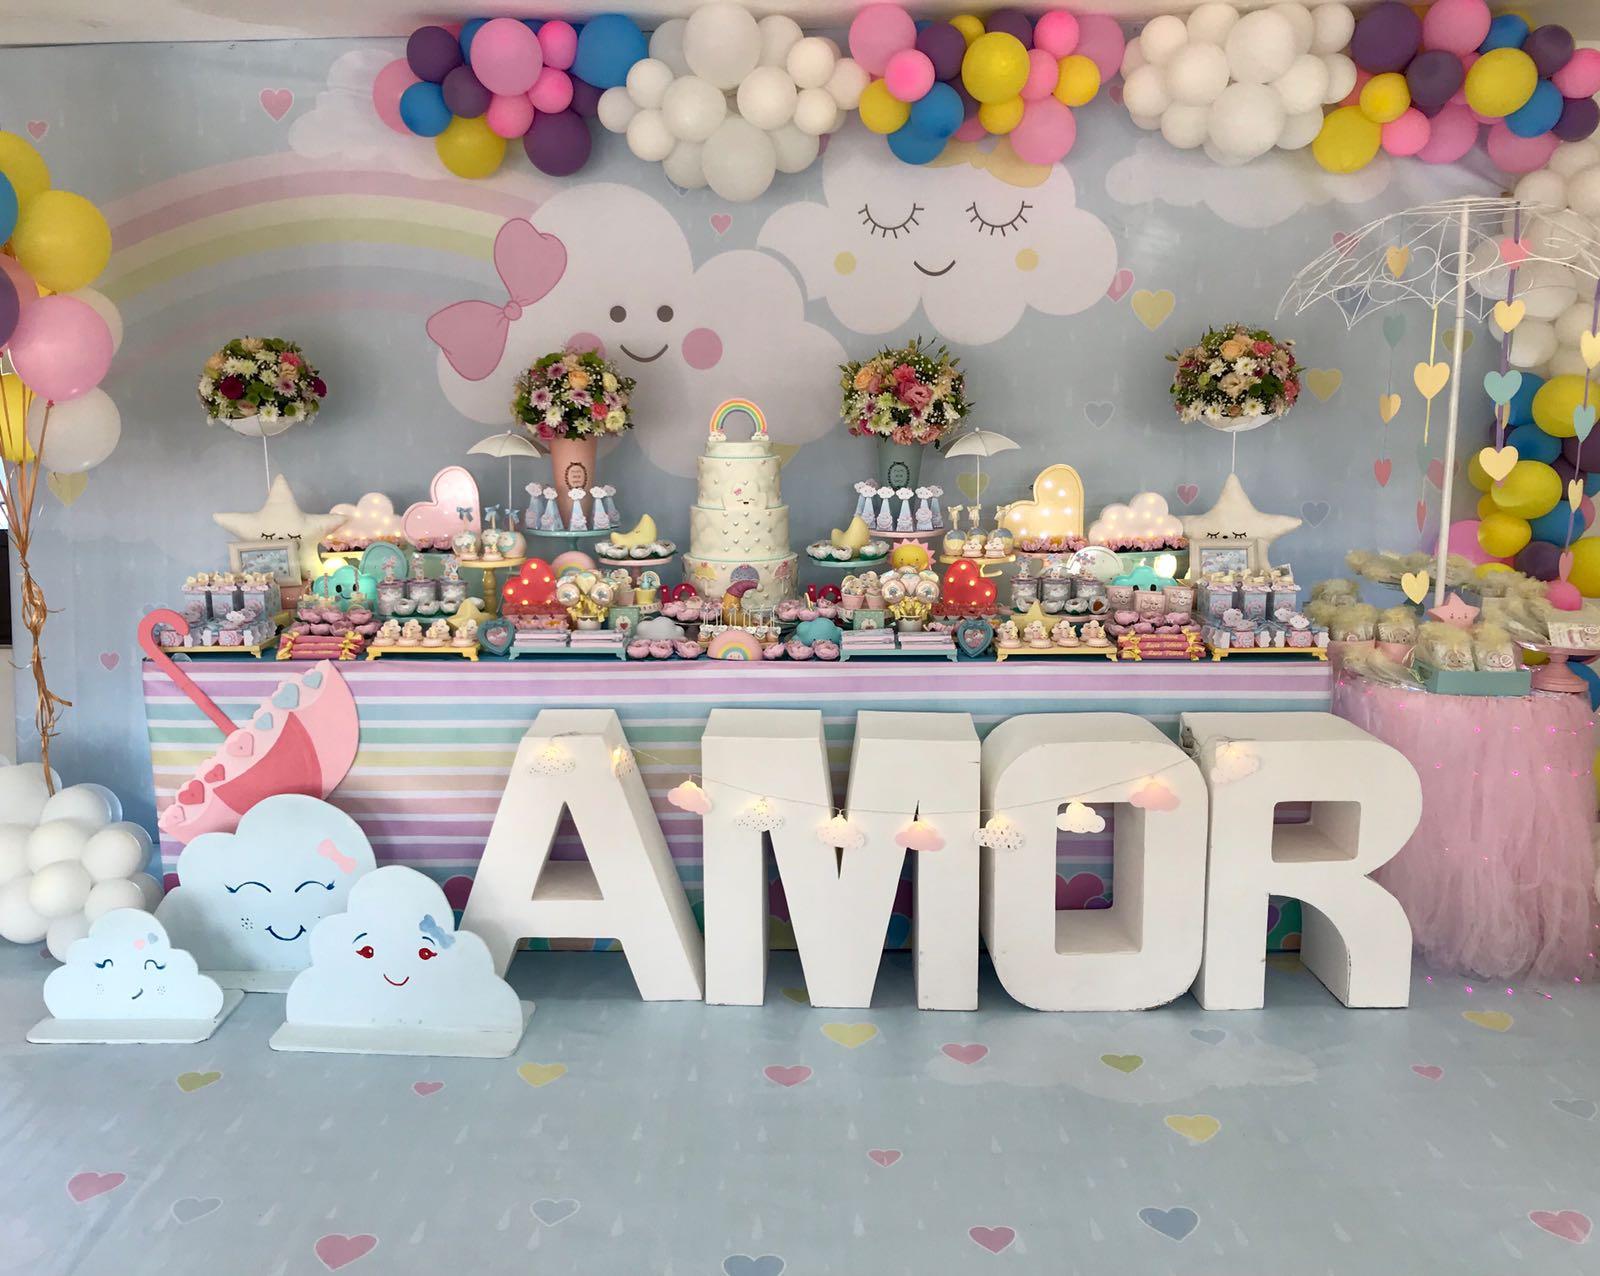 Festa'Chuva de Amor' 1 u00ba Aniversário Maria Vitória Les Demoiselles EXCEL u00caNCIA NO SEU  -> Decoração Festa Aniversario Chuva De Amor